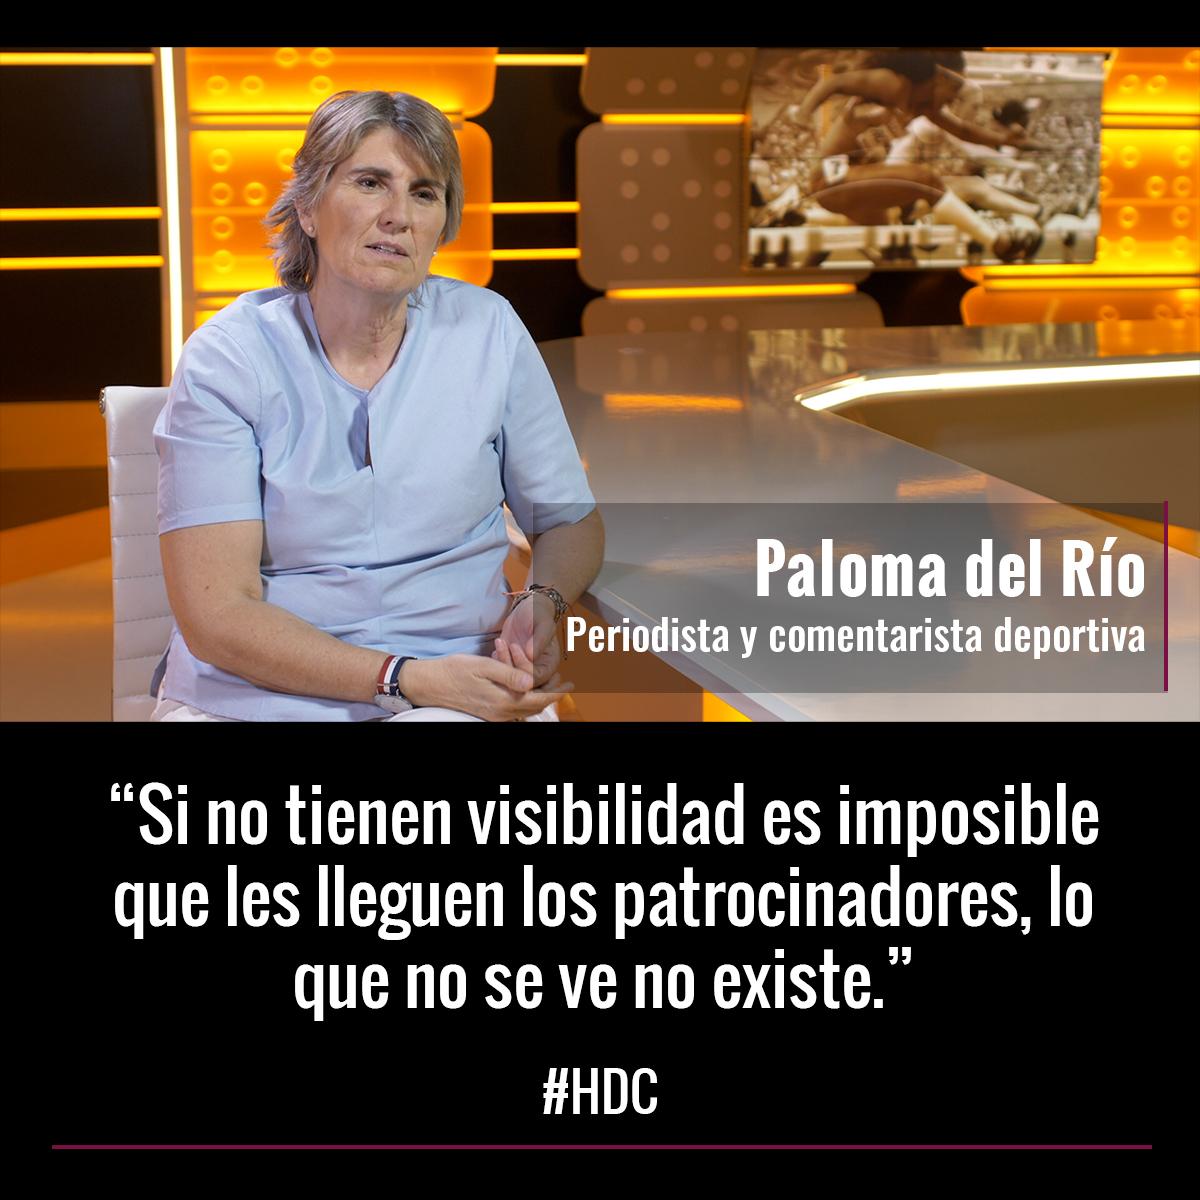 HDC_Promo_Frase_PalomaDelRío